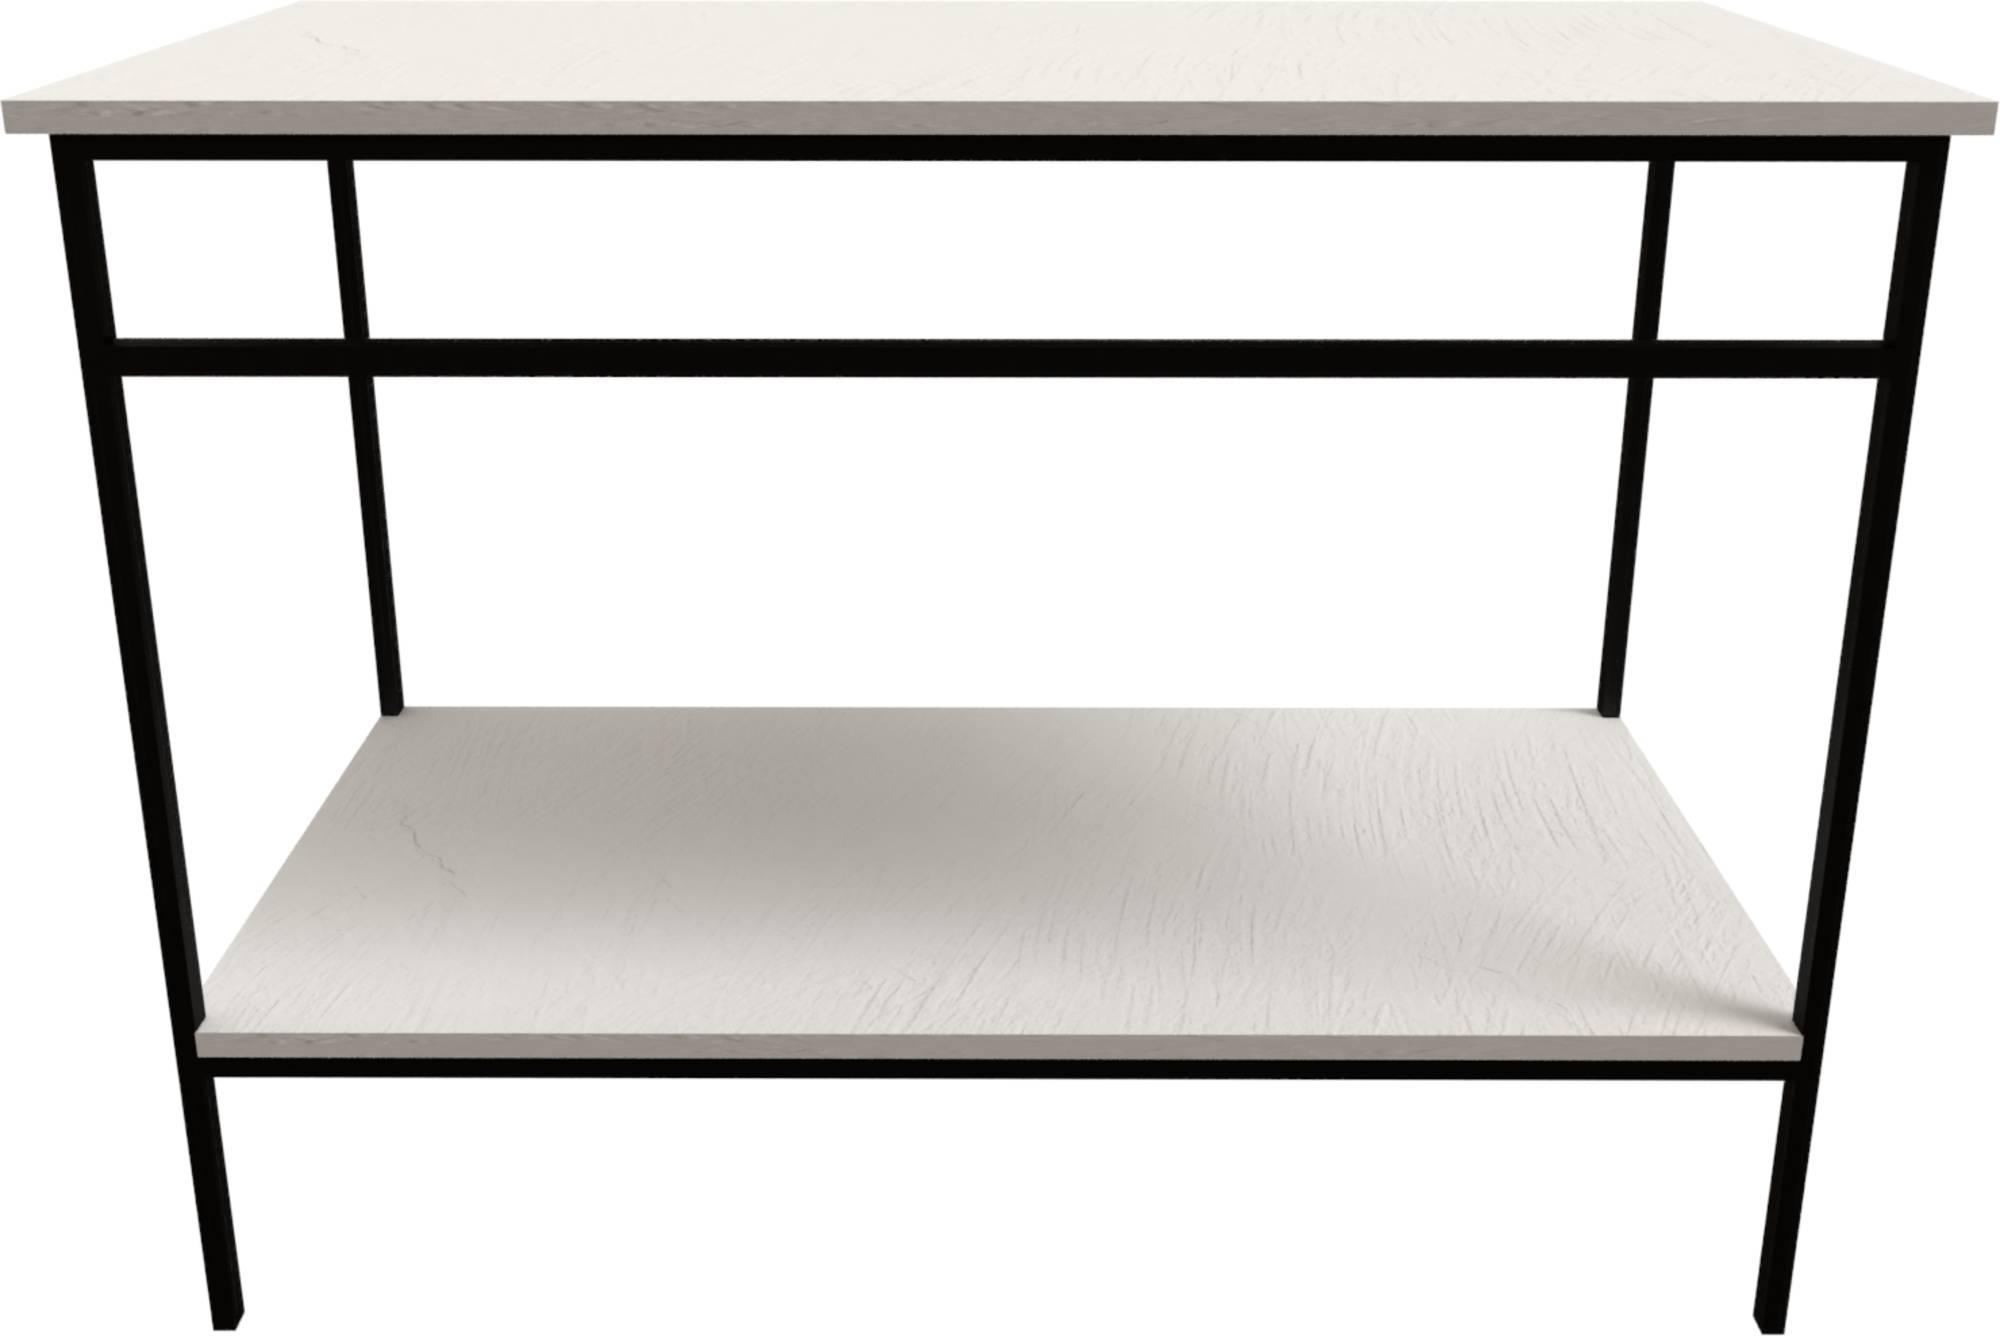 Ben Avira Set Staand Frame met Blad 120,3x46,5x85 cm Mat Zwart/Glans Wit